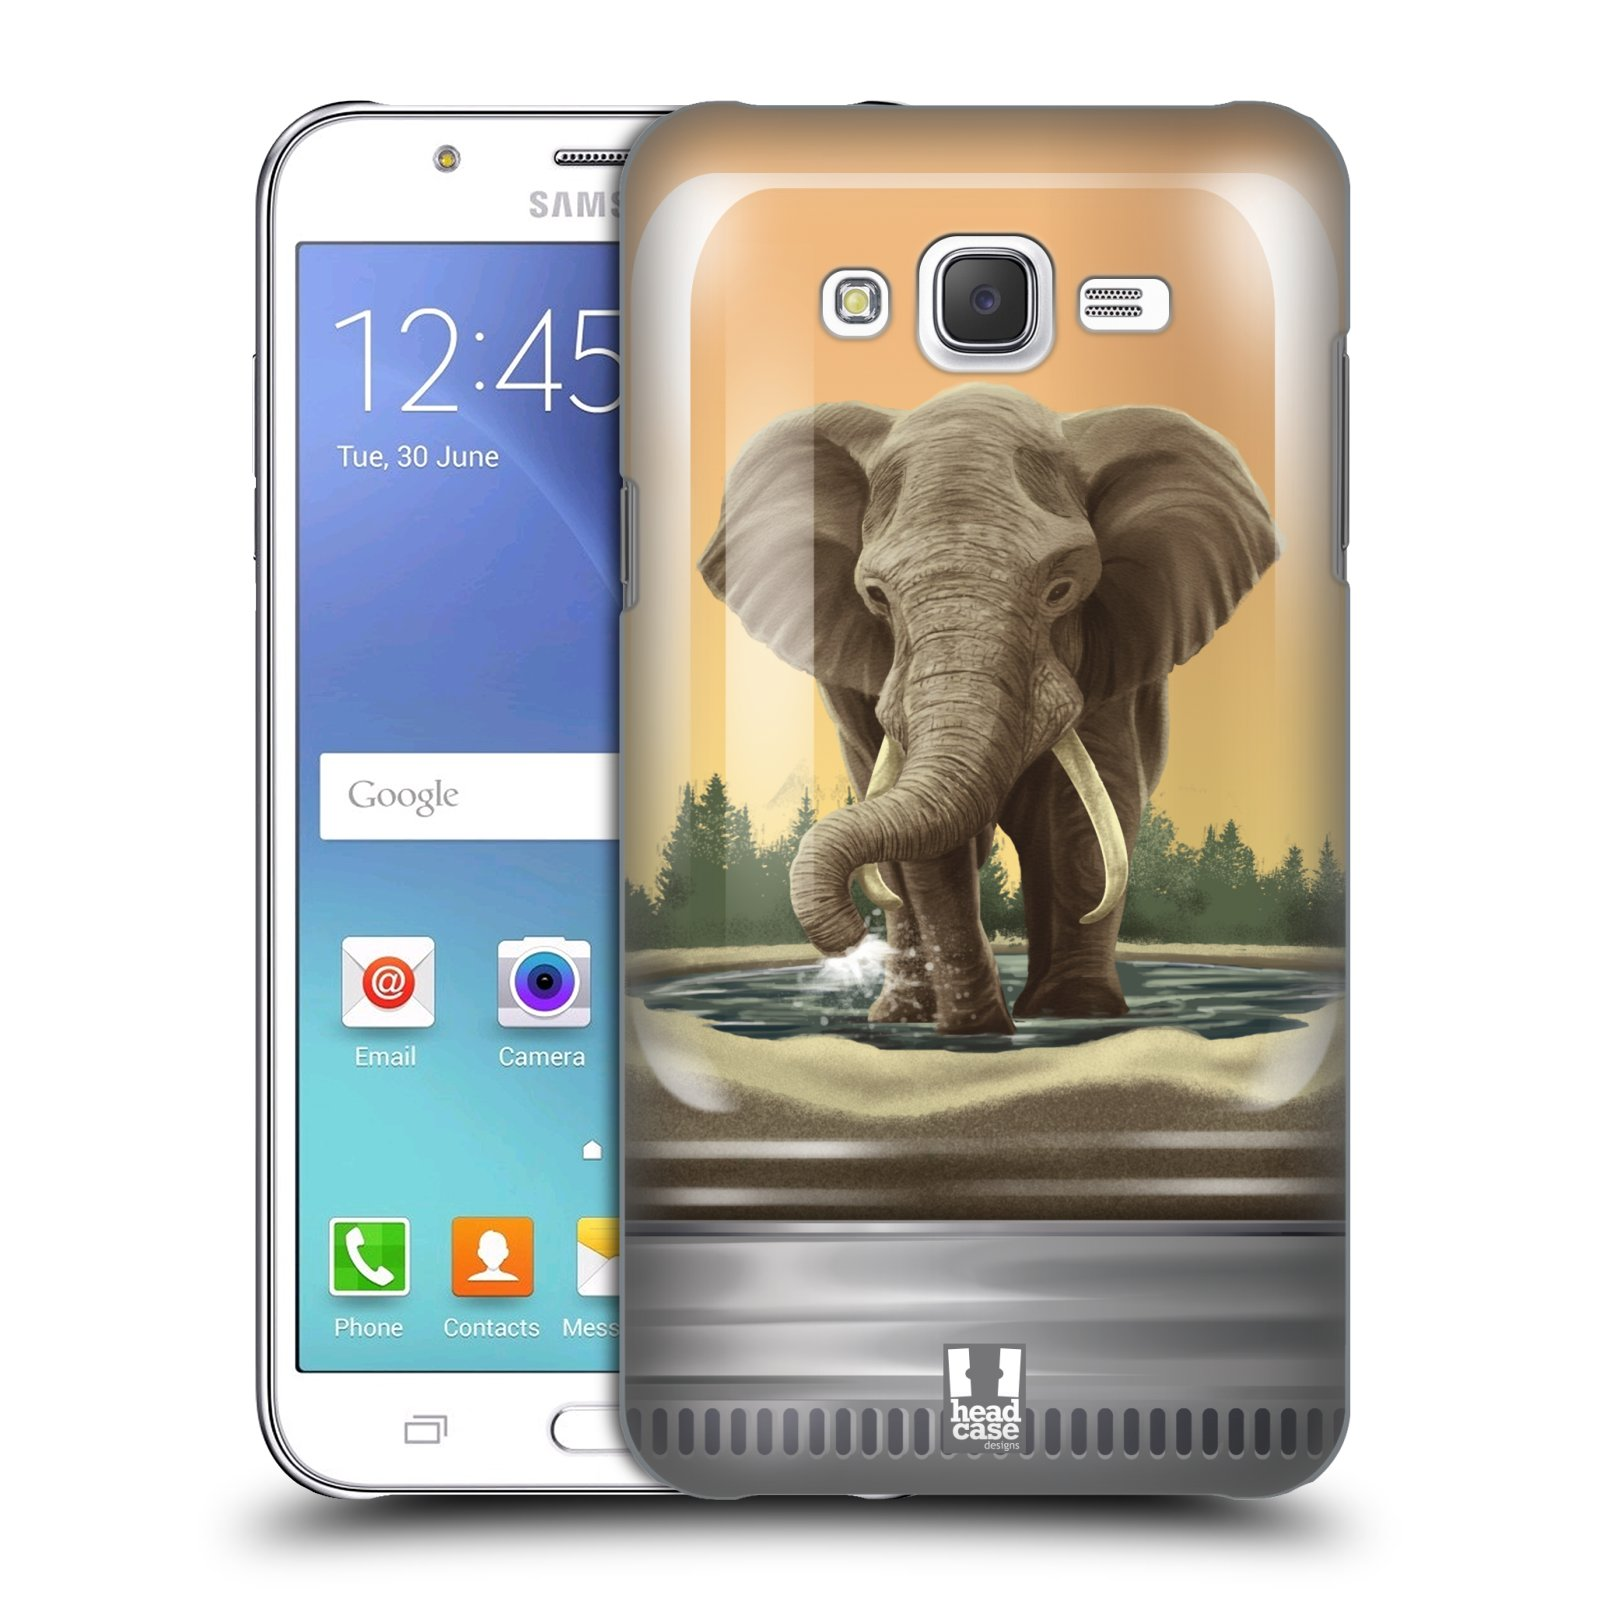 HEAD CASE plastový obal na mobil SAMSUNG Galaxy J7, J700 vzor Zvířátka v těžítku slon